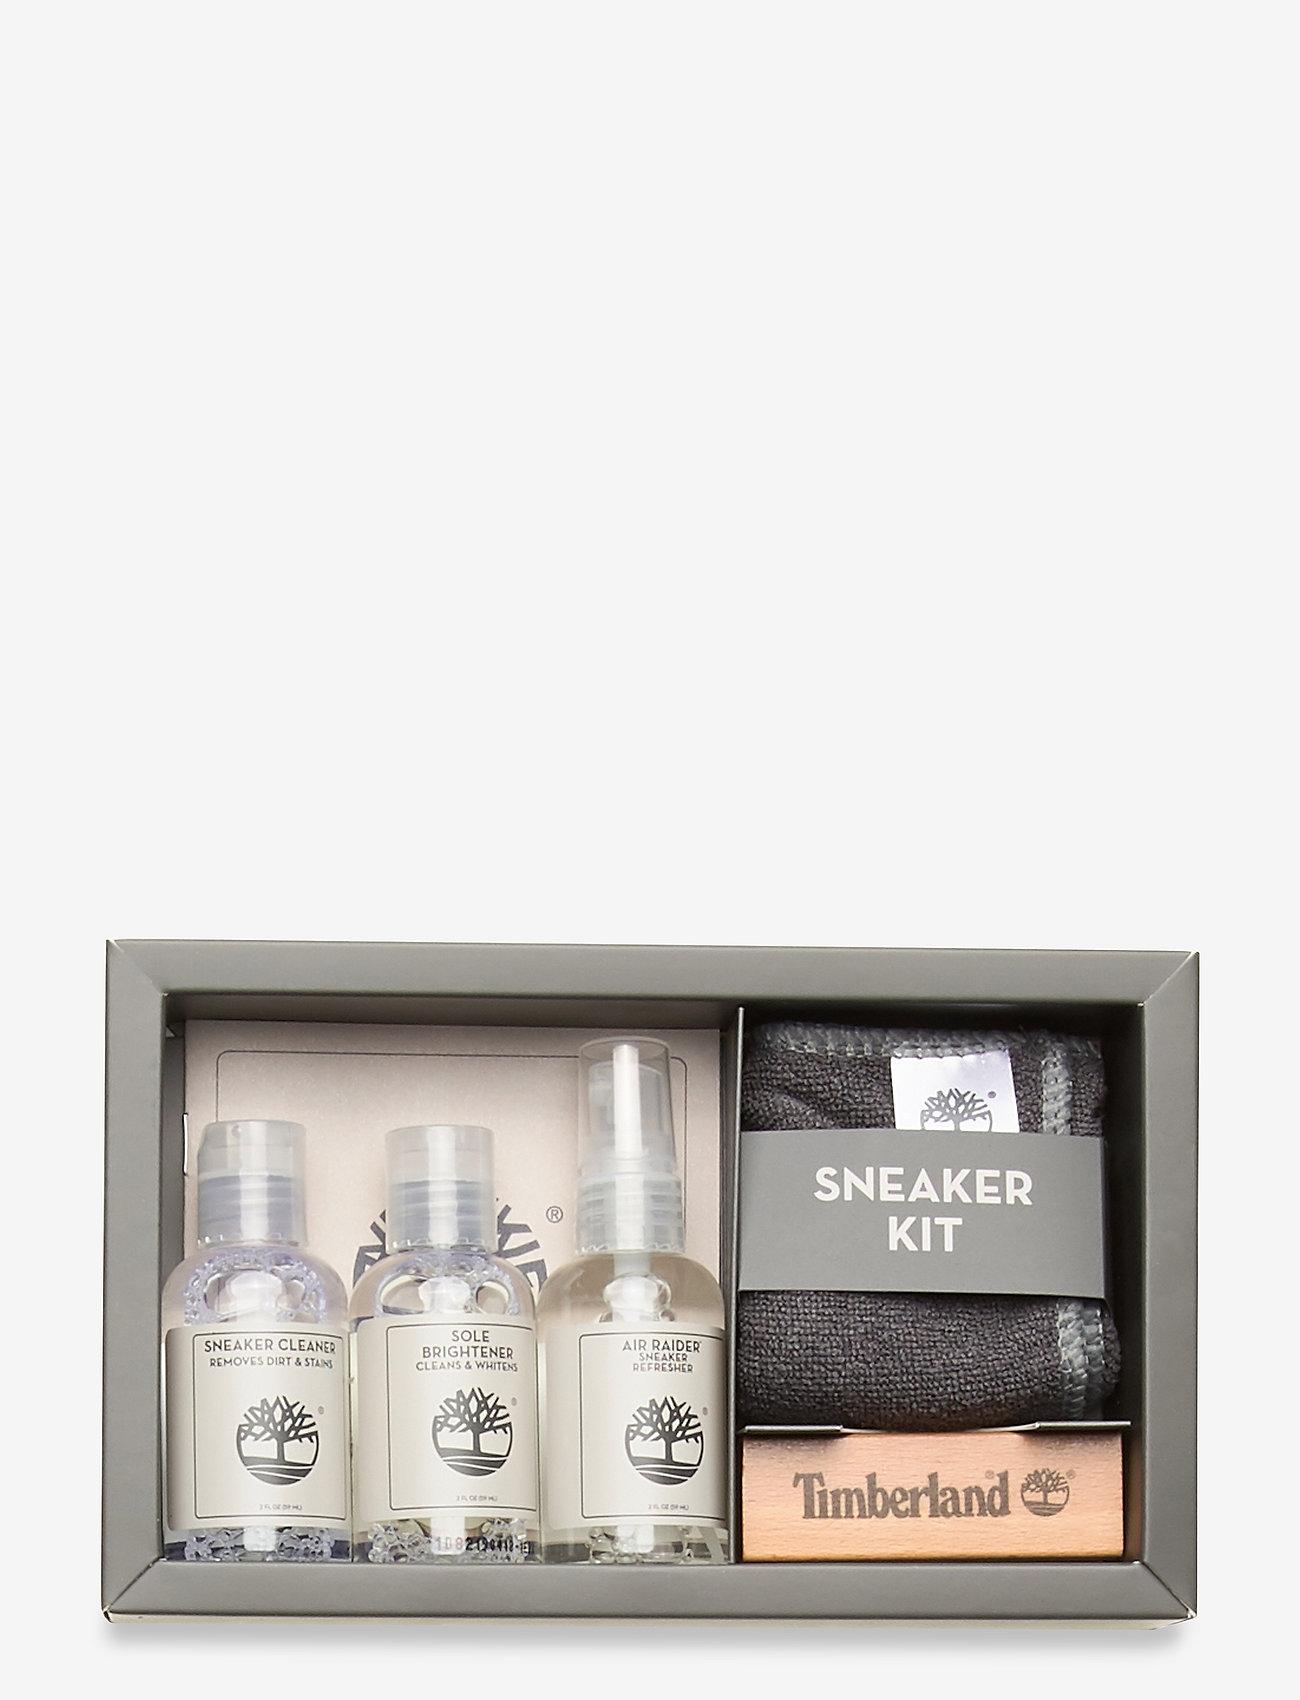 Timberland - Sneaker Kit NA/EU - shoe protection - no color - 1